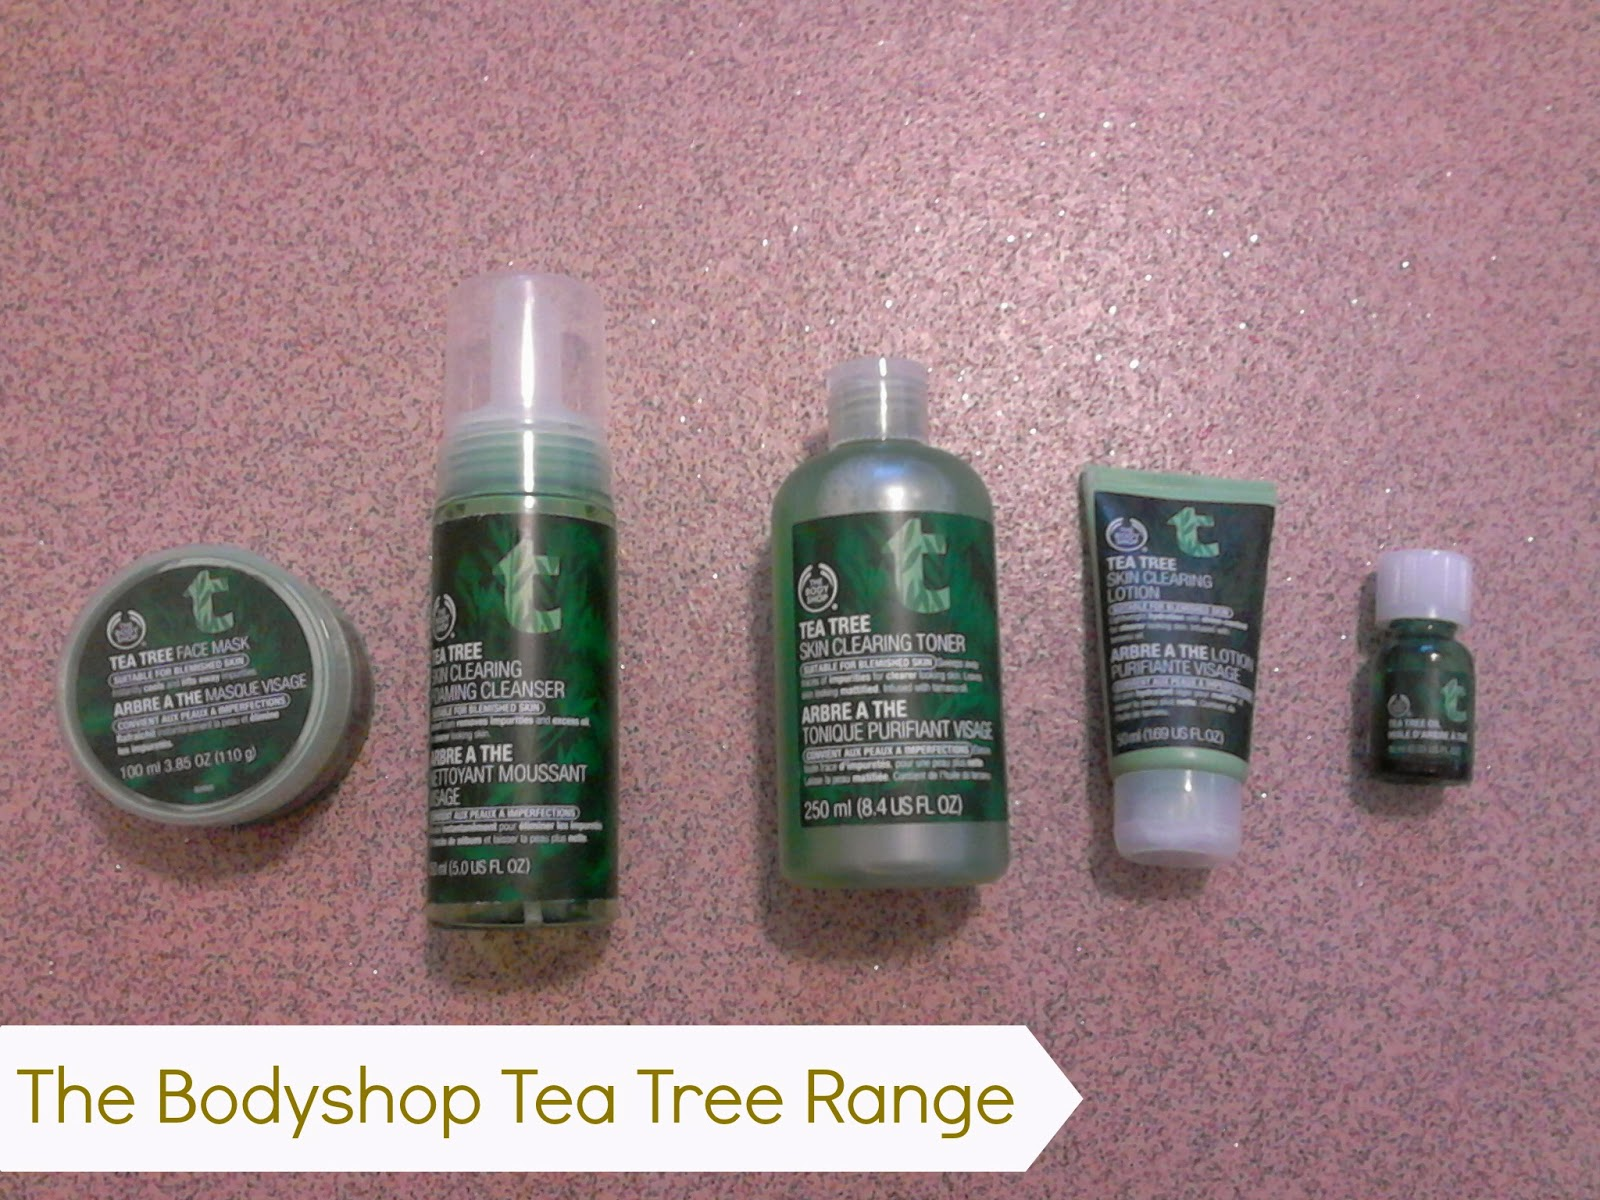 The Body Shop Tea Tree Range